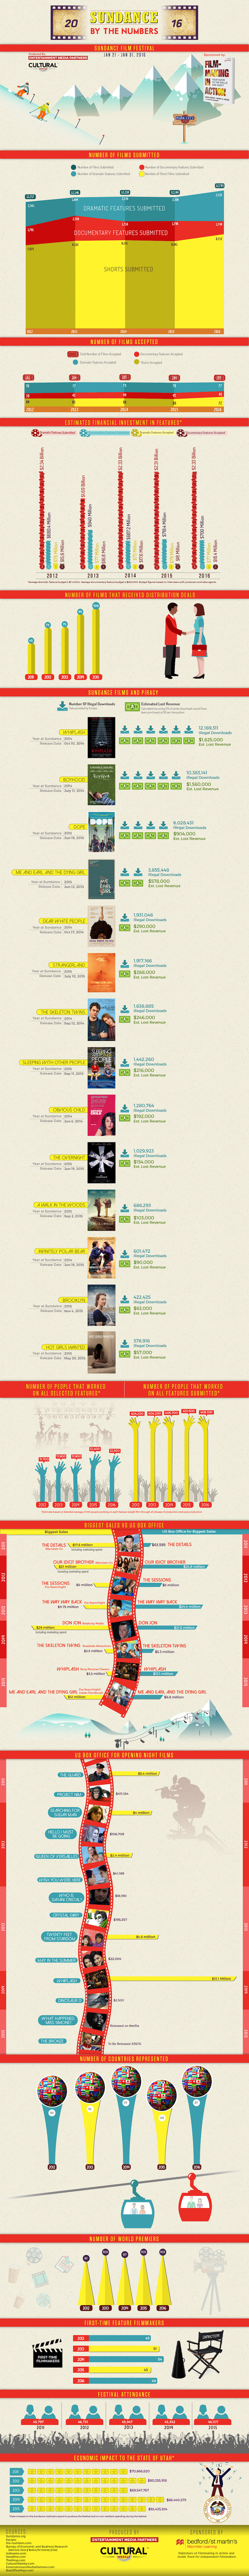 Sundance Infographic 2016